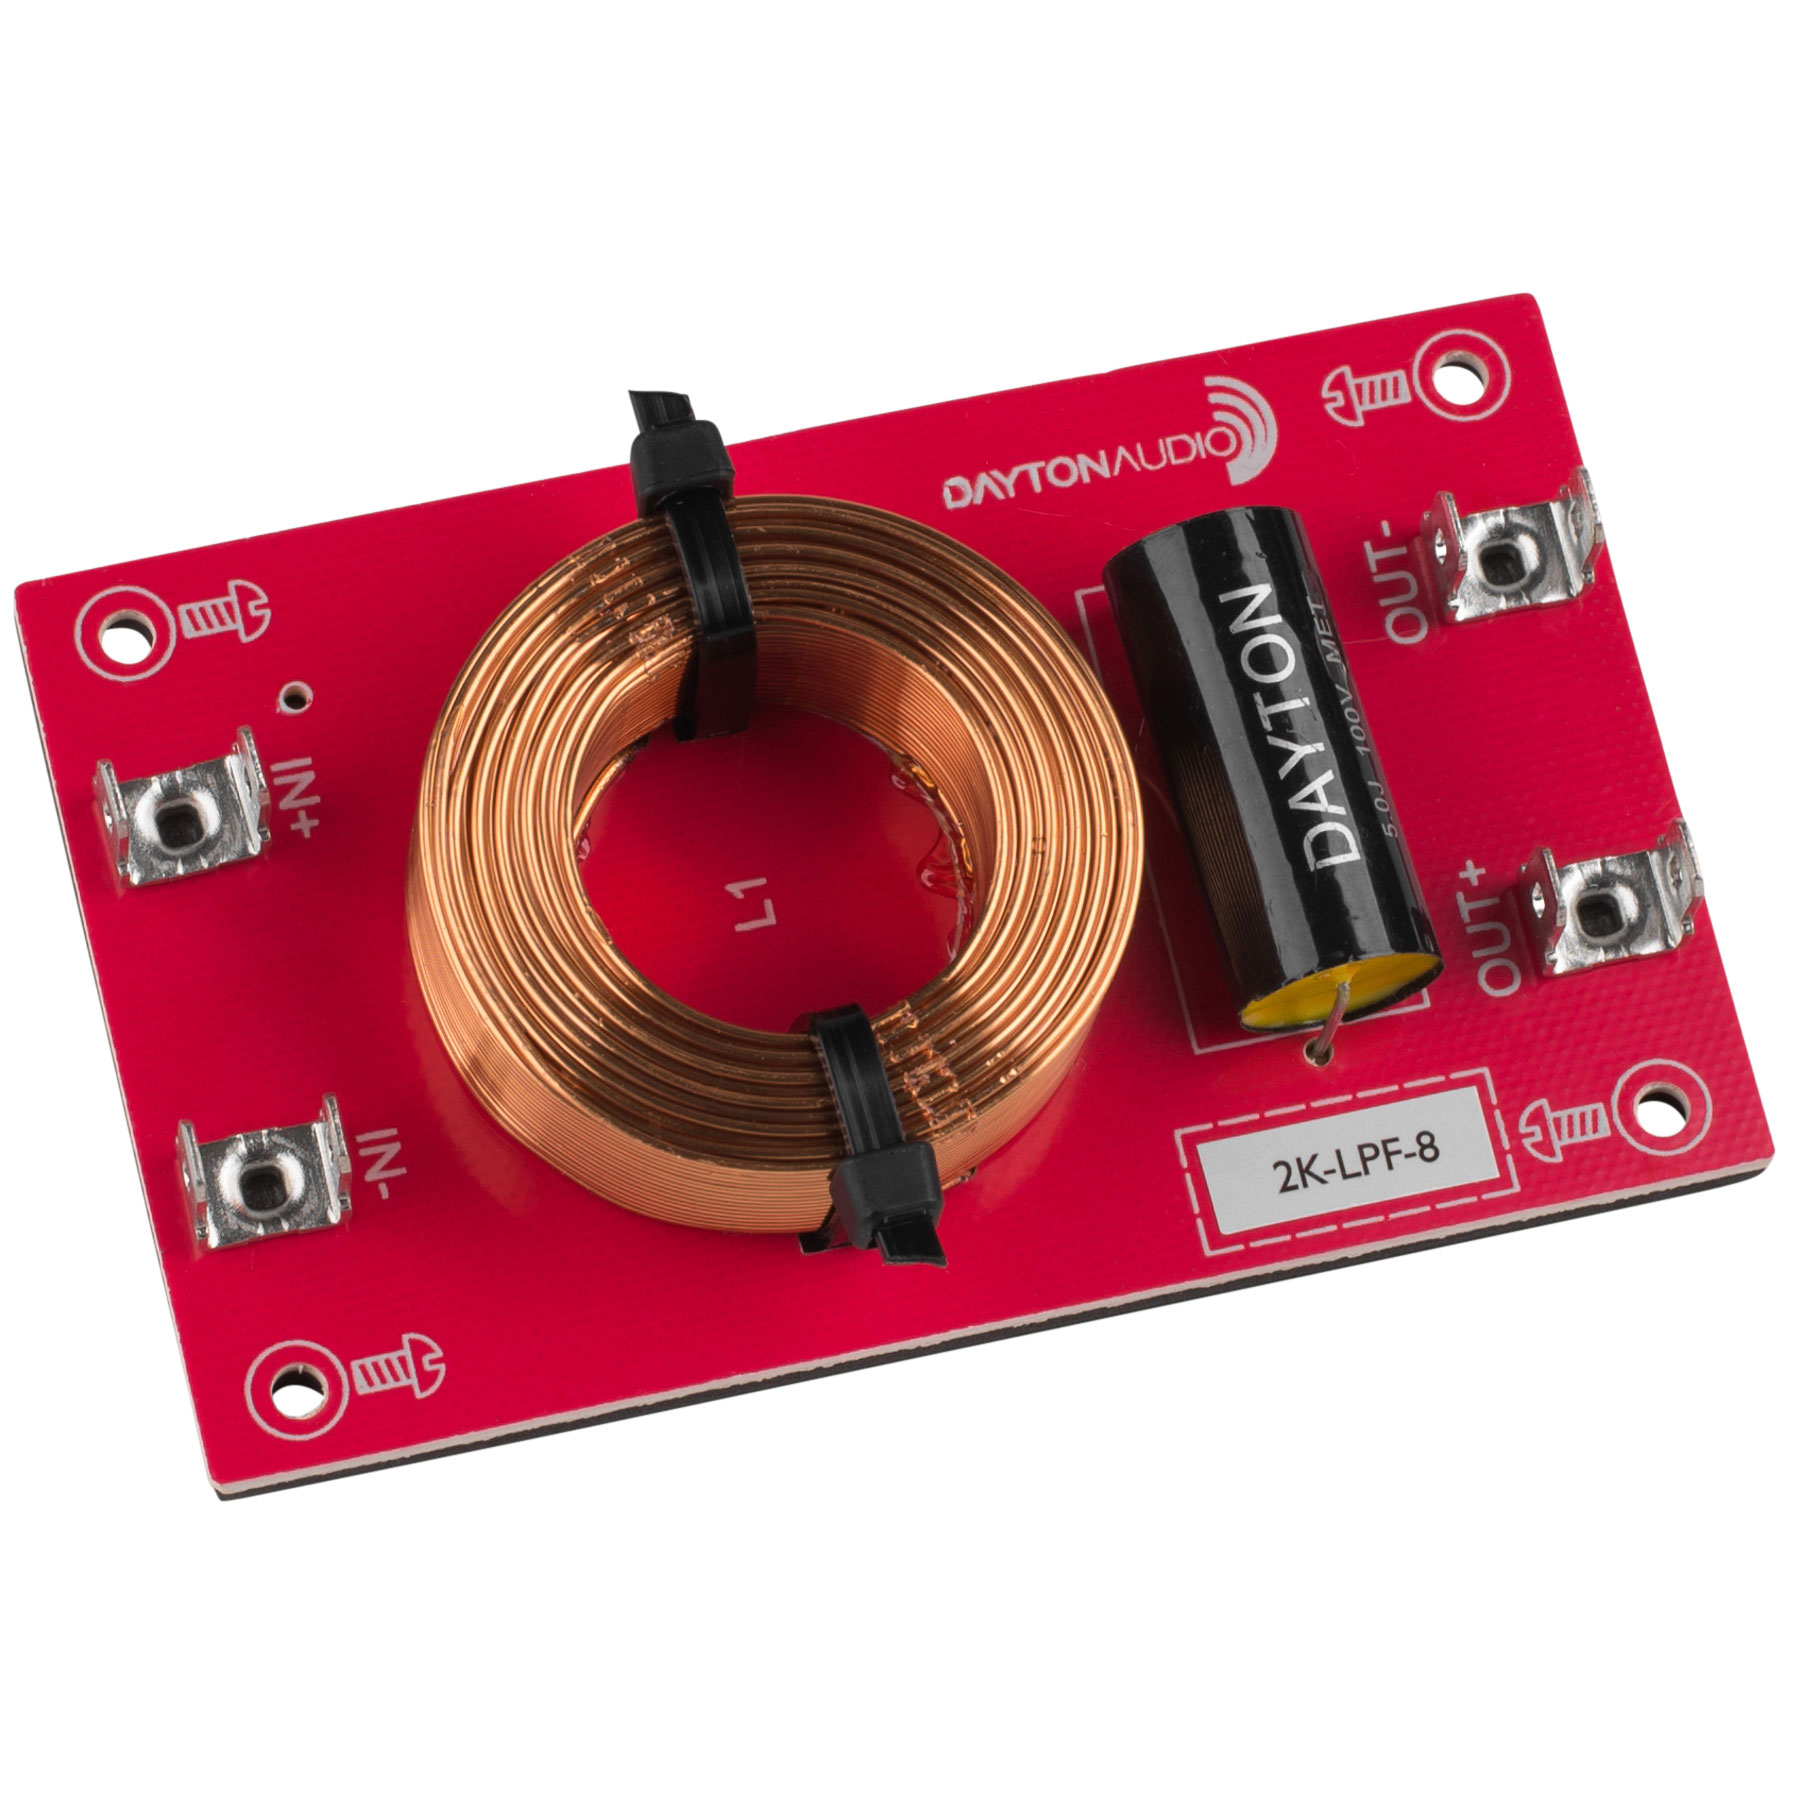 [DLF10]Dayton Audio 2k-LPF-8(2,000 Hz:12 dB/Oct)画像